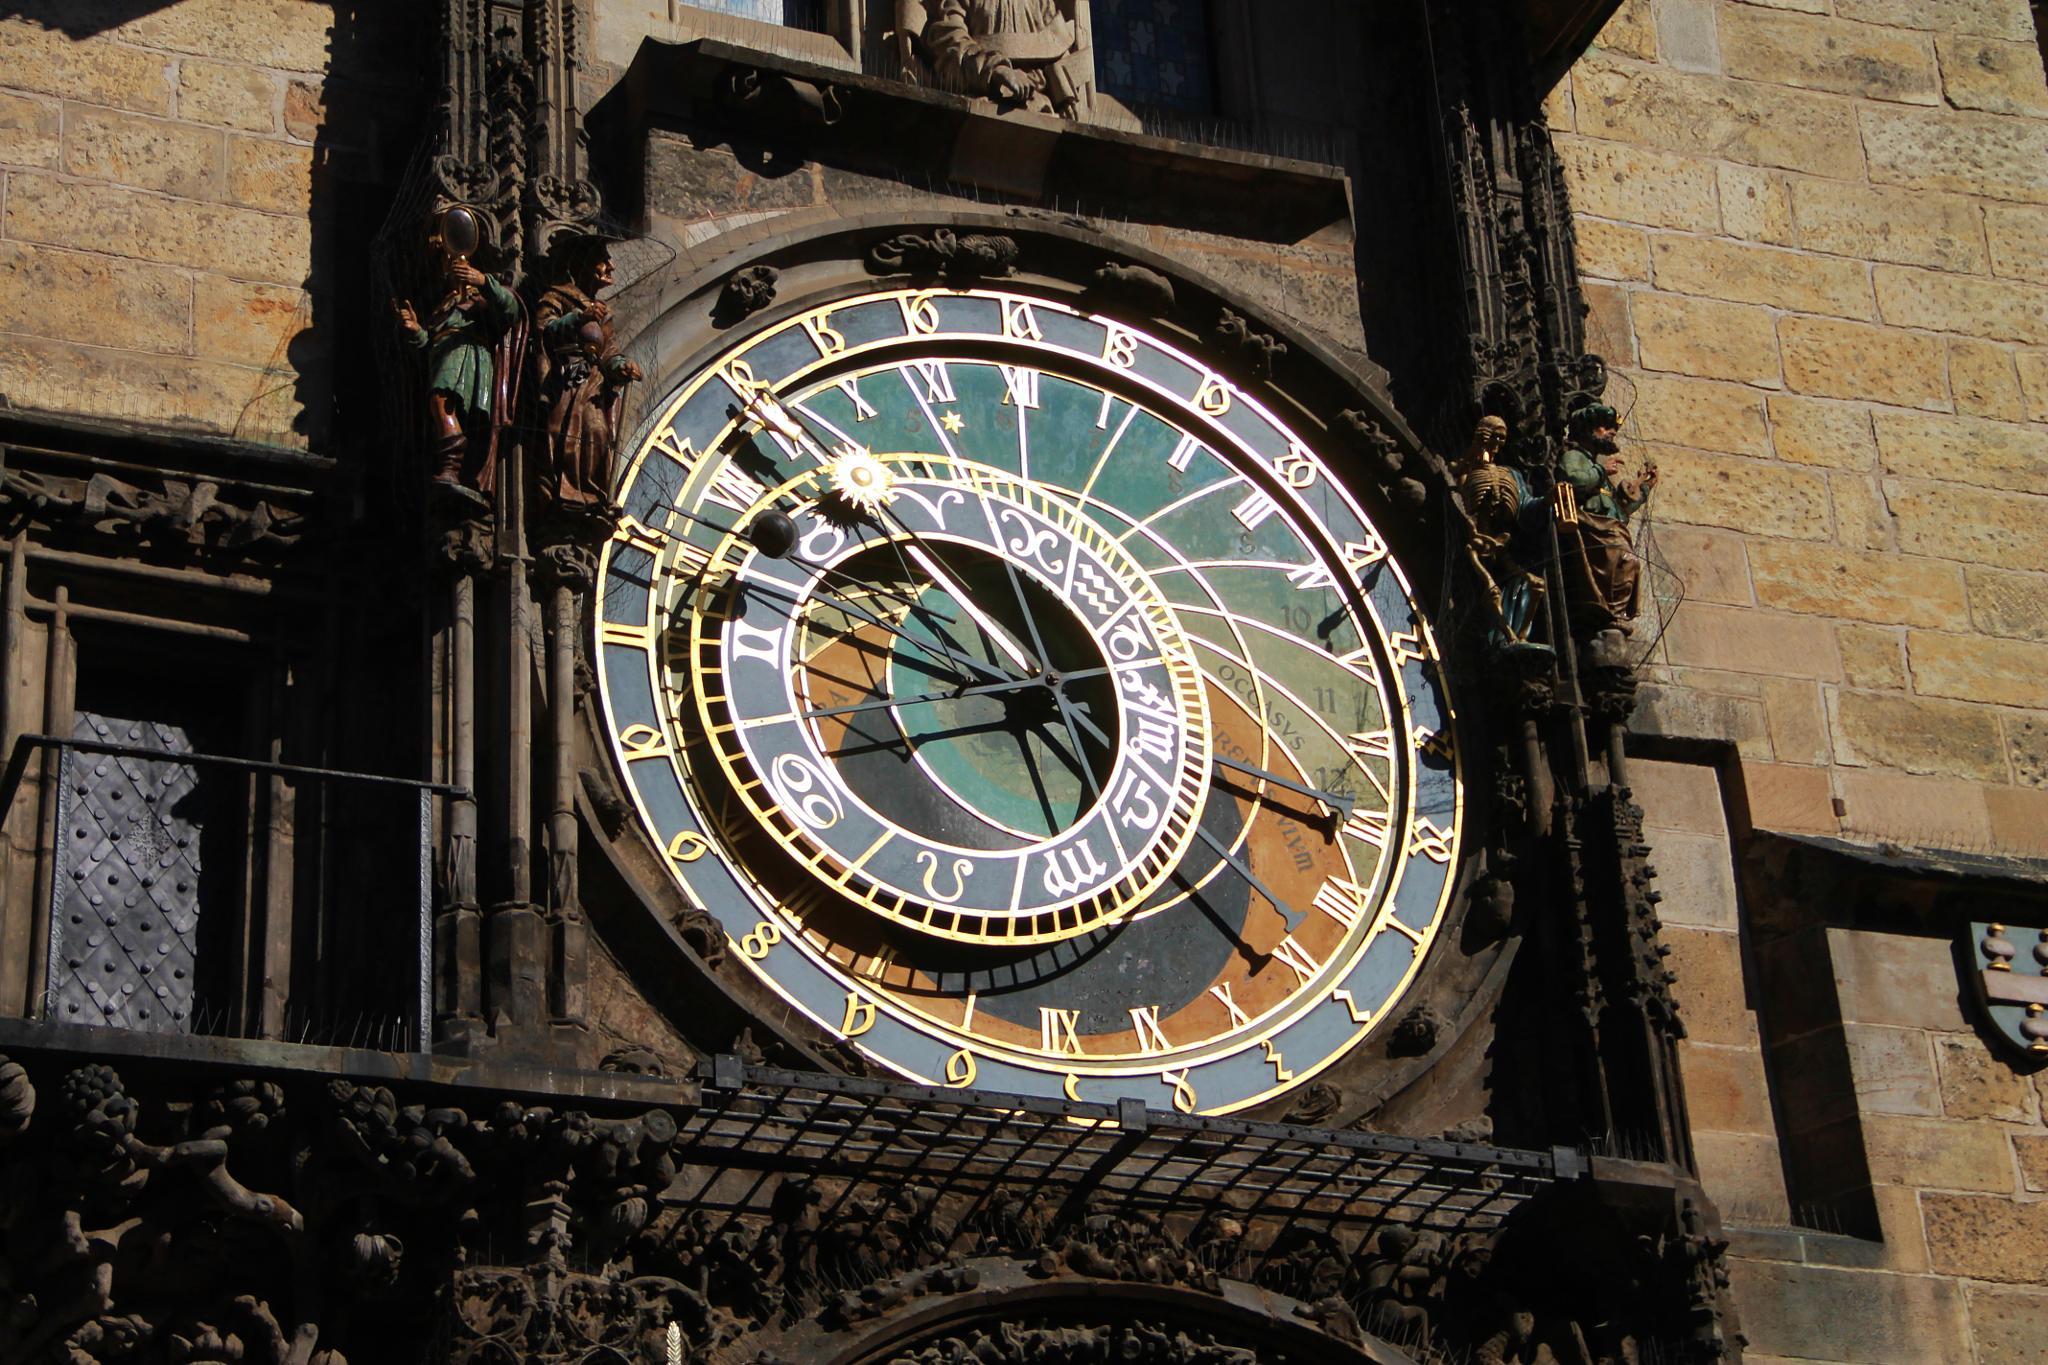 astronomical clock by ichernin